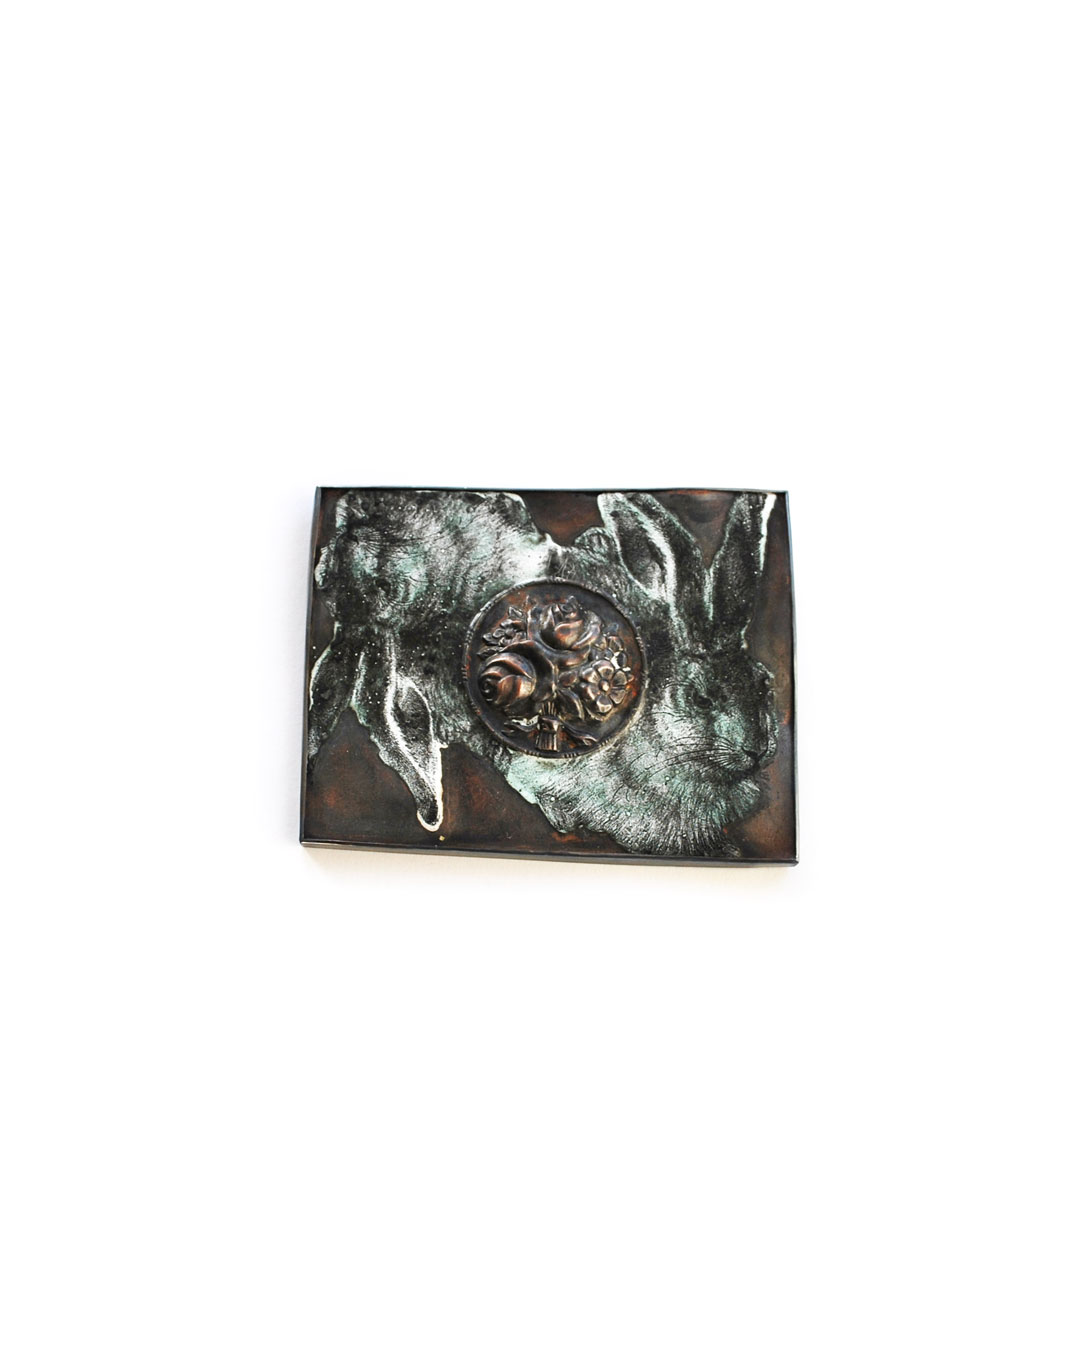 Vera Siemund, untitled, 2015, brooch; enamelled copper, silver, 80 x 65 x 9 mm, €850